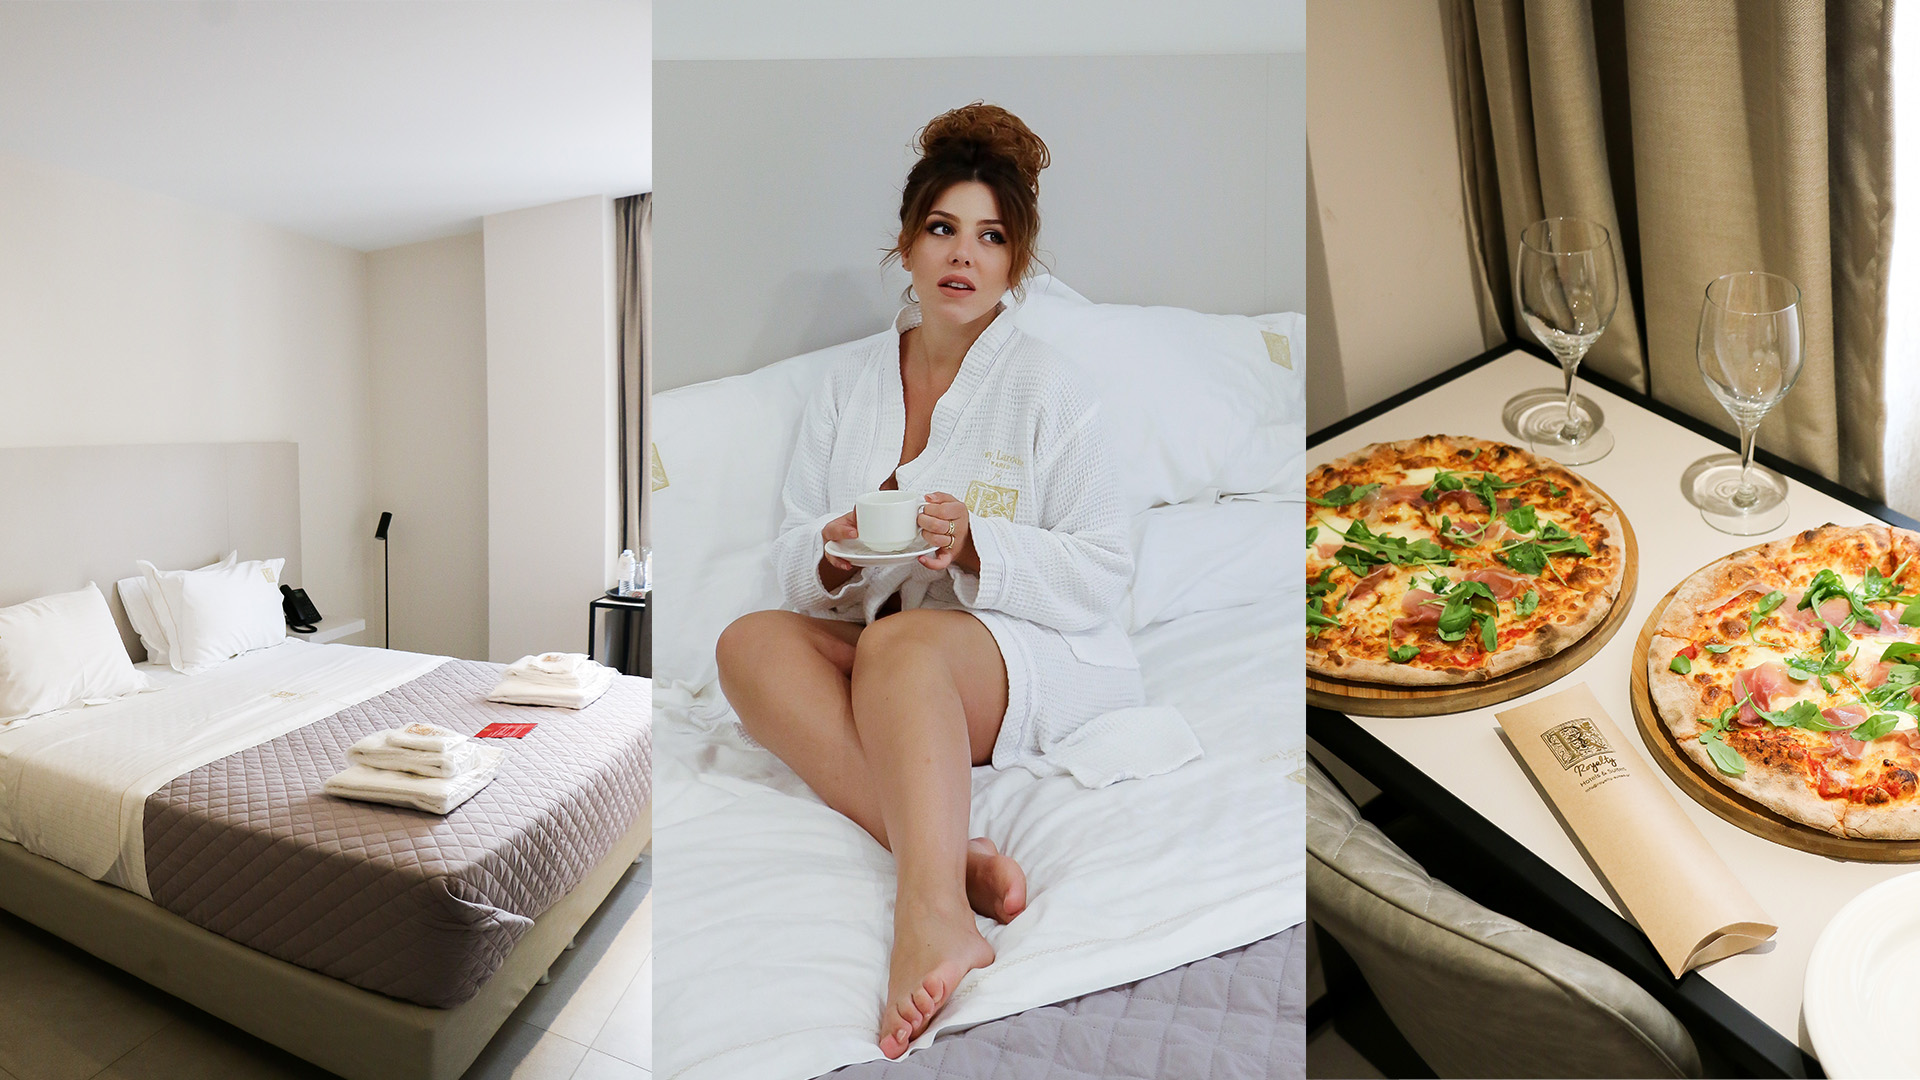 avis-hotel-athenes-royalty-athens-hotel-grèce-voyage